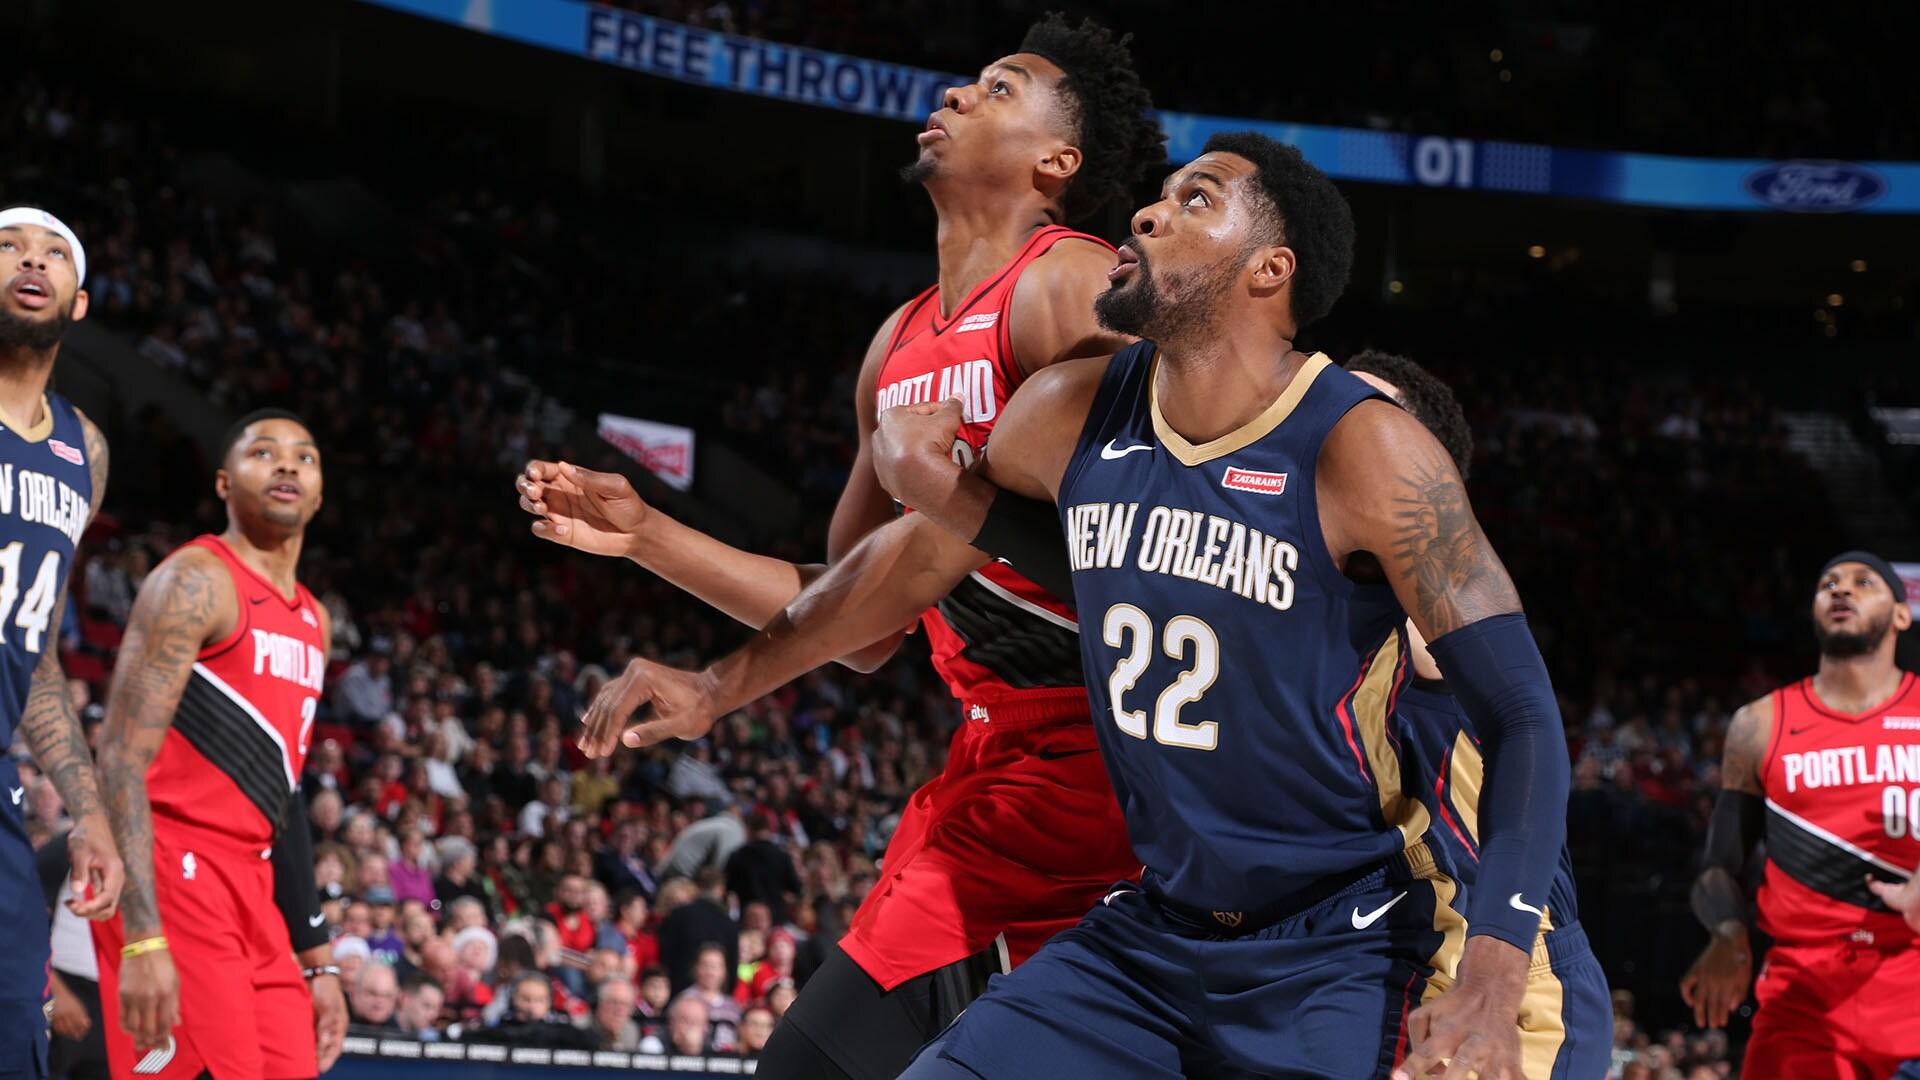 Pelicans @ Trail Blazers